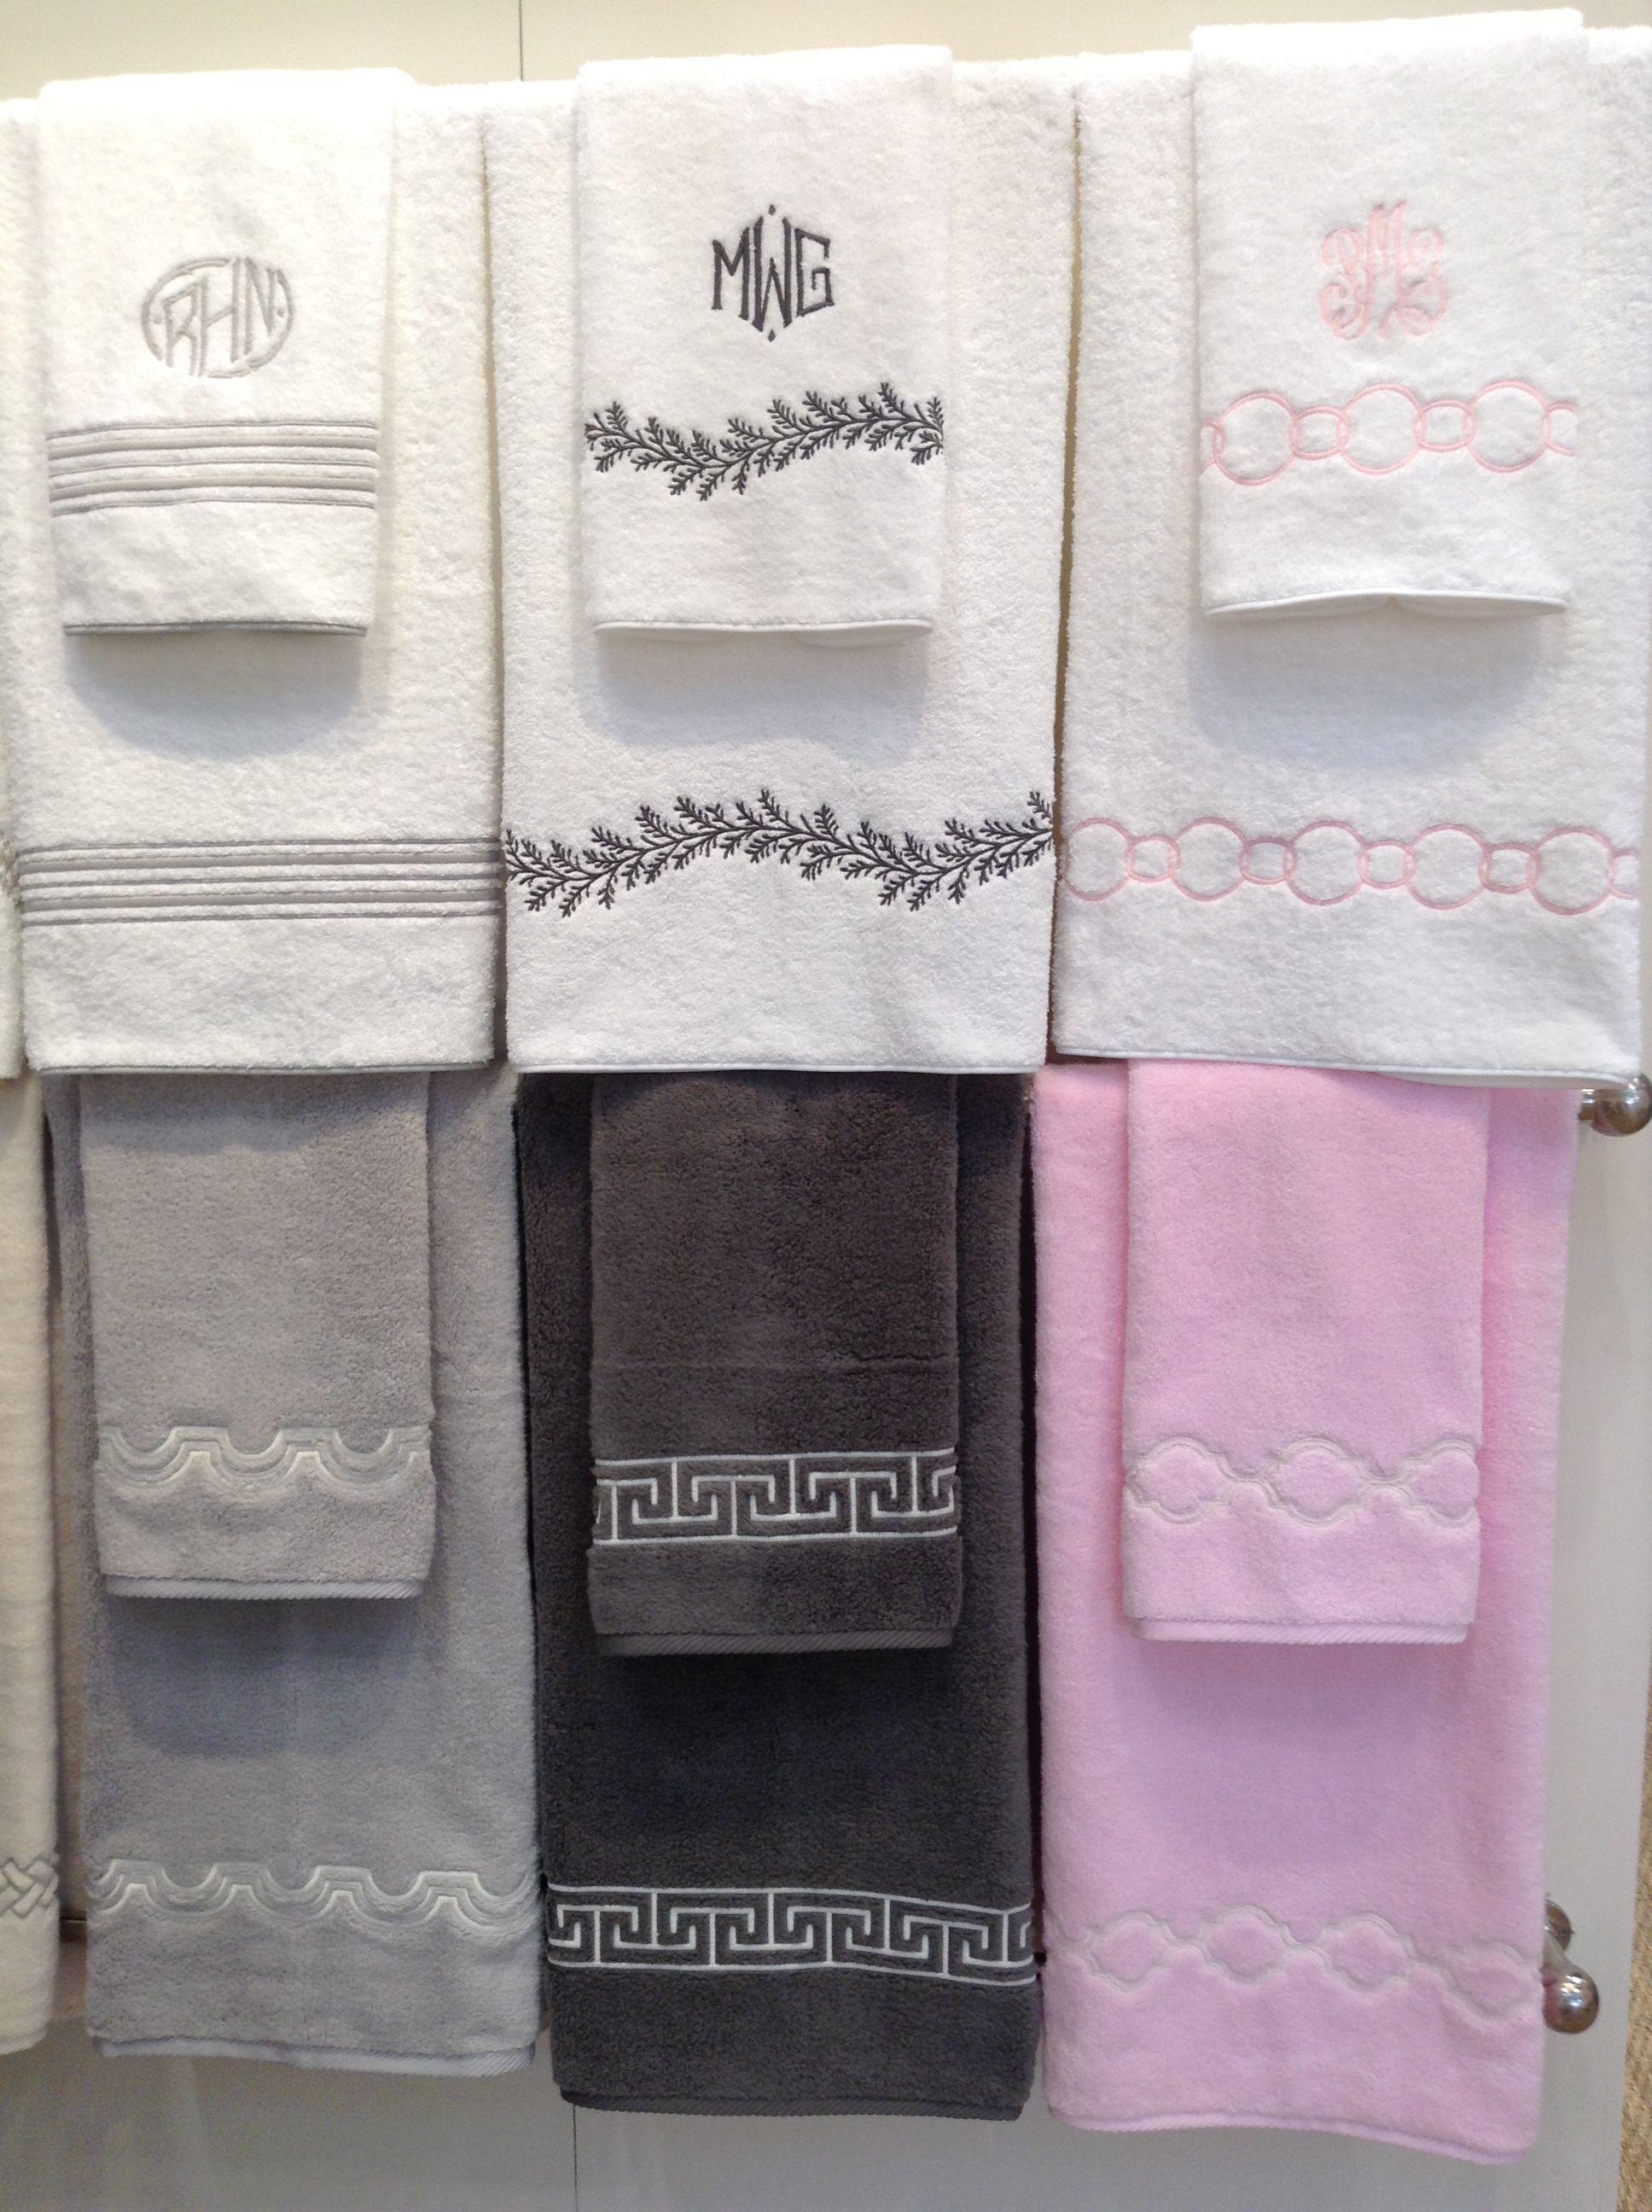 Closet Full Of Linens Offers Luxury Bedding, Plush Bath Accessories